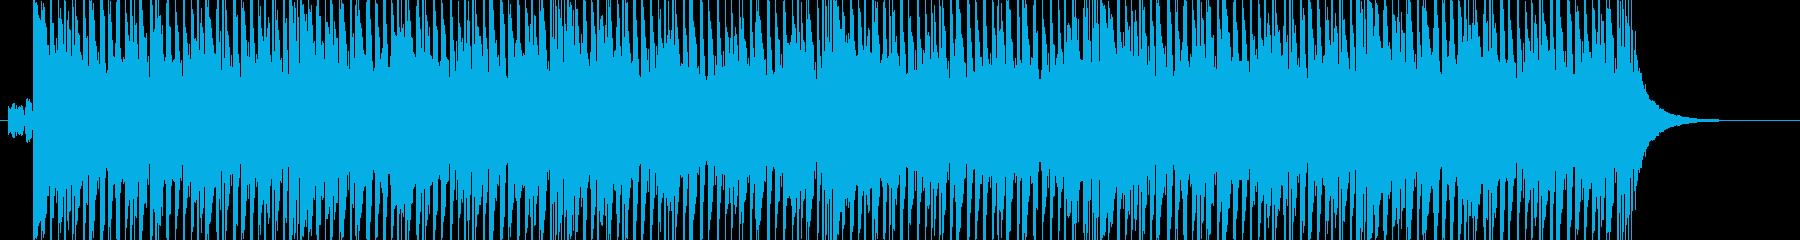 Happy Ukulele 5の再生済みの波形